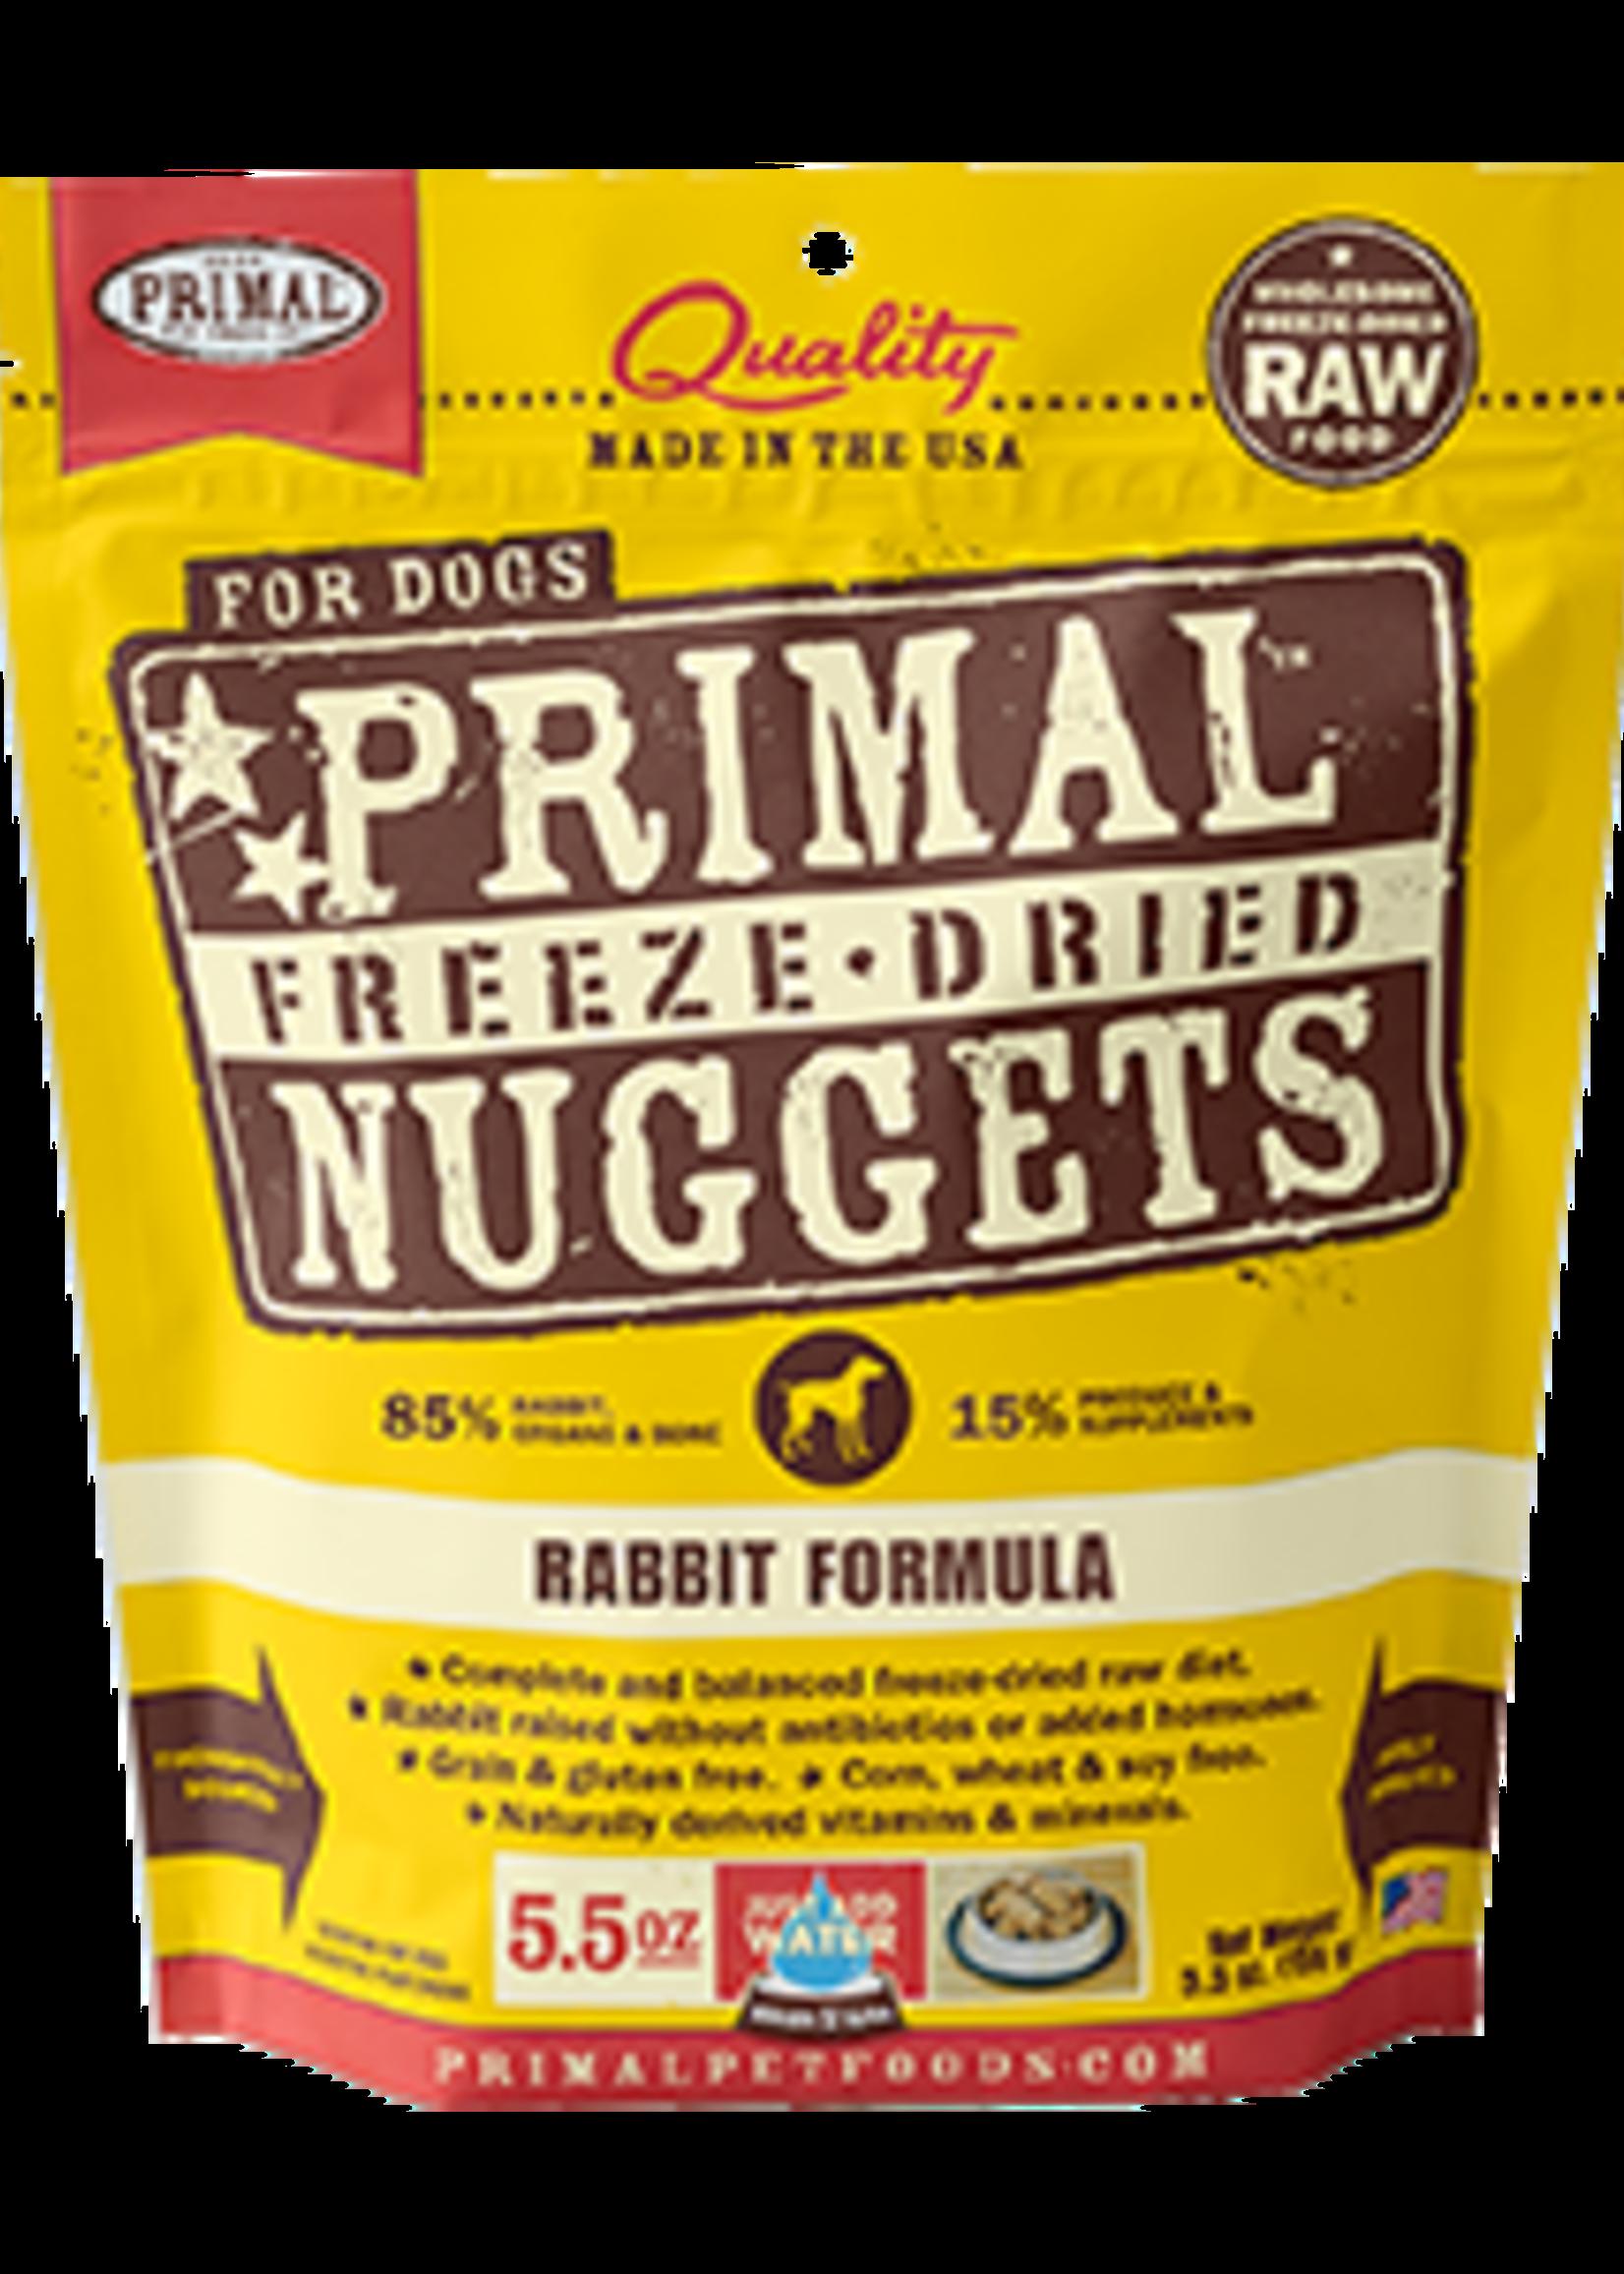 Primal Primal Dog Freeze Dried Rabbit  Nugget 14 oz.